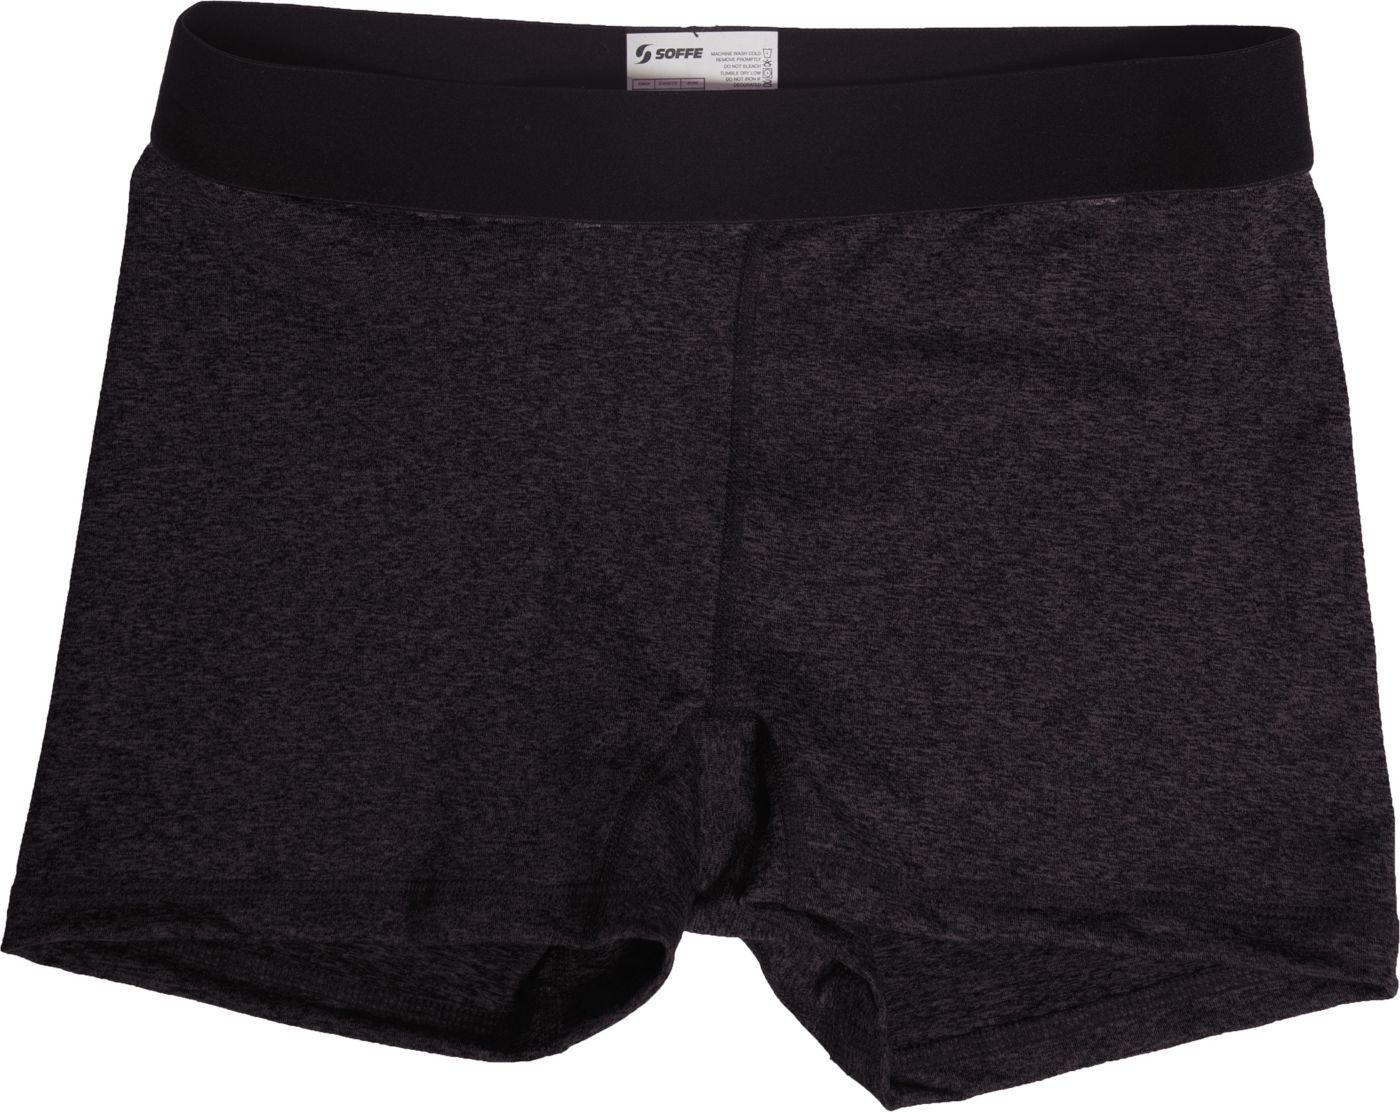 Soffe Girls' Dri Team Shorts